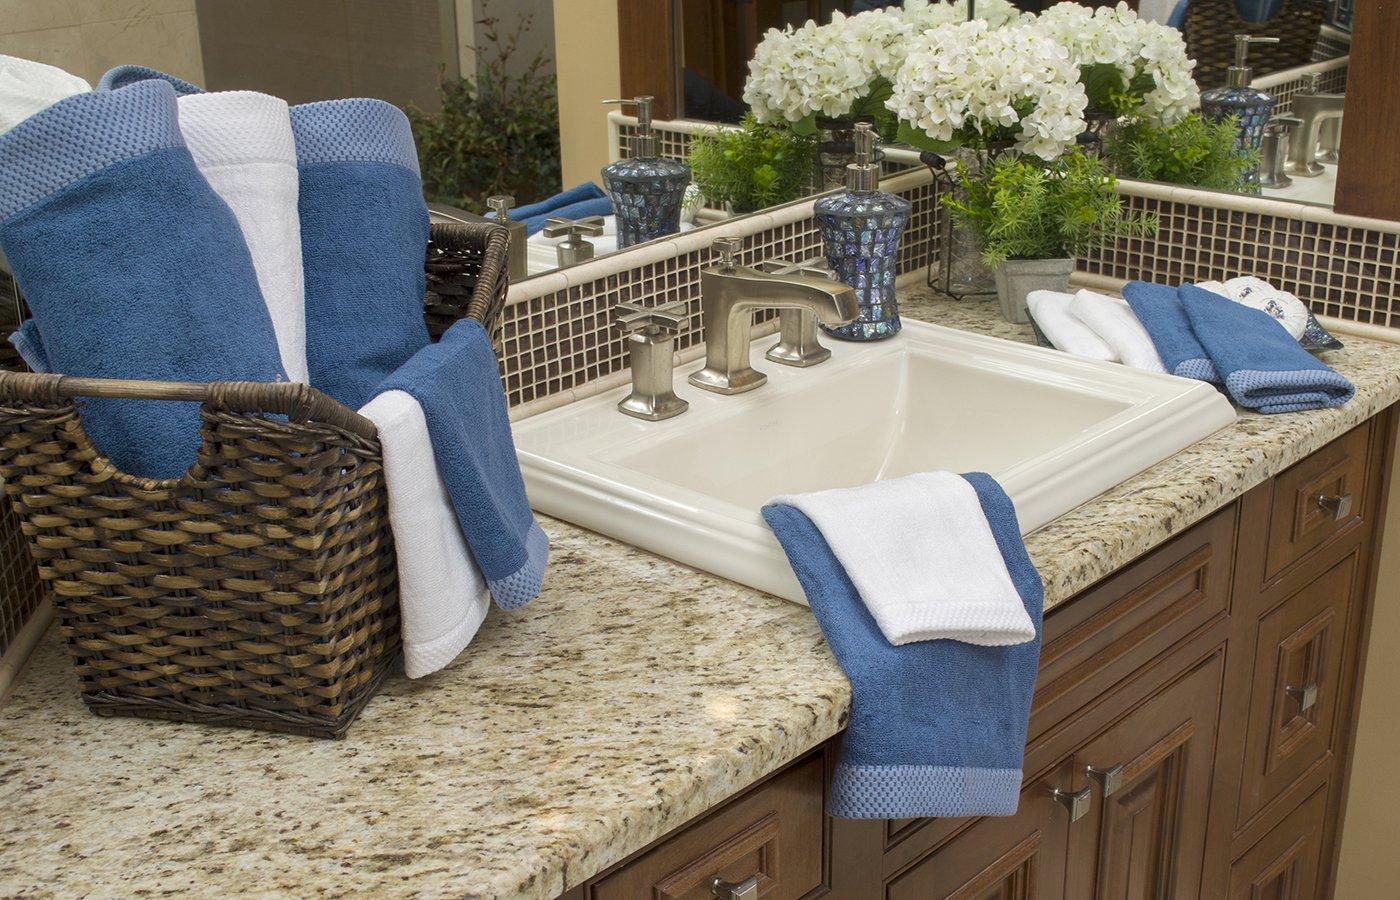 White BedVoyage Eco Resort Collection Bath Towel